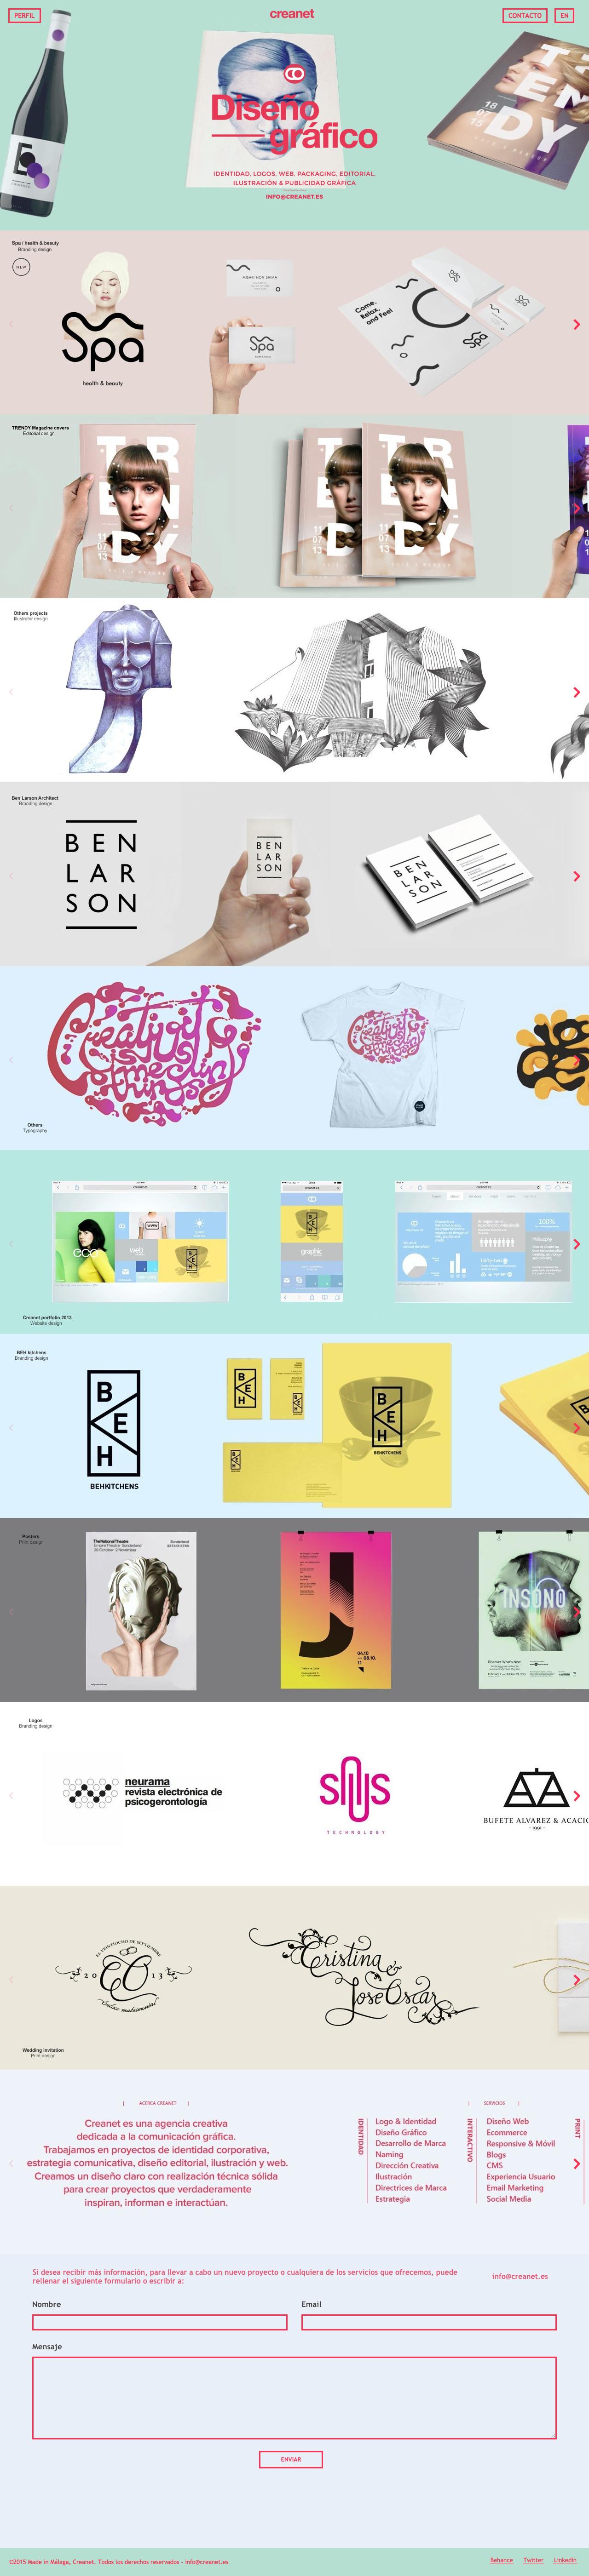 Creanet Website Screenshot